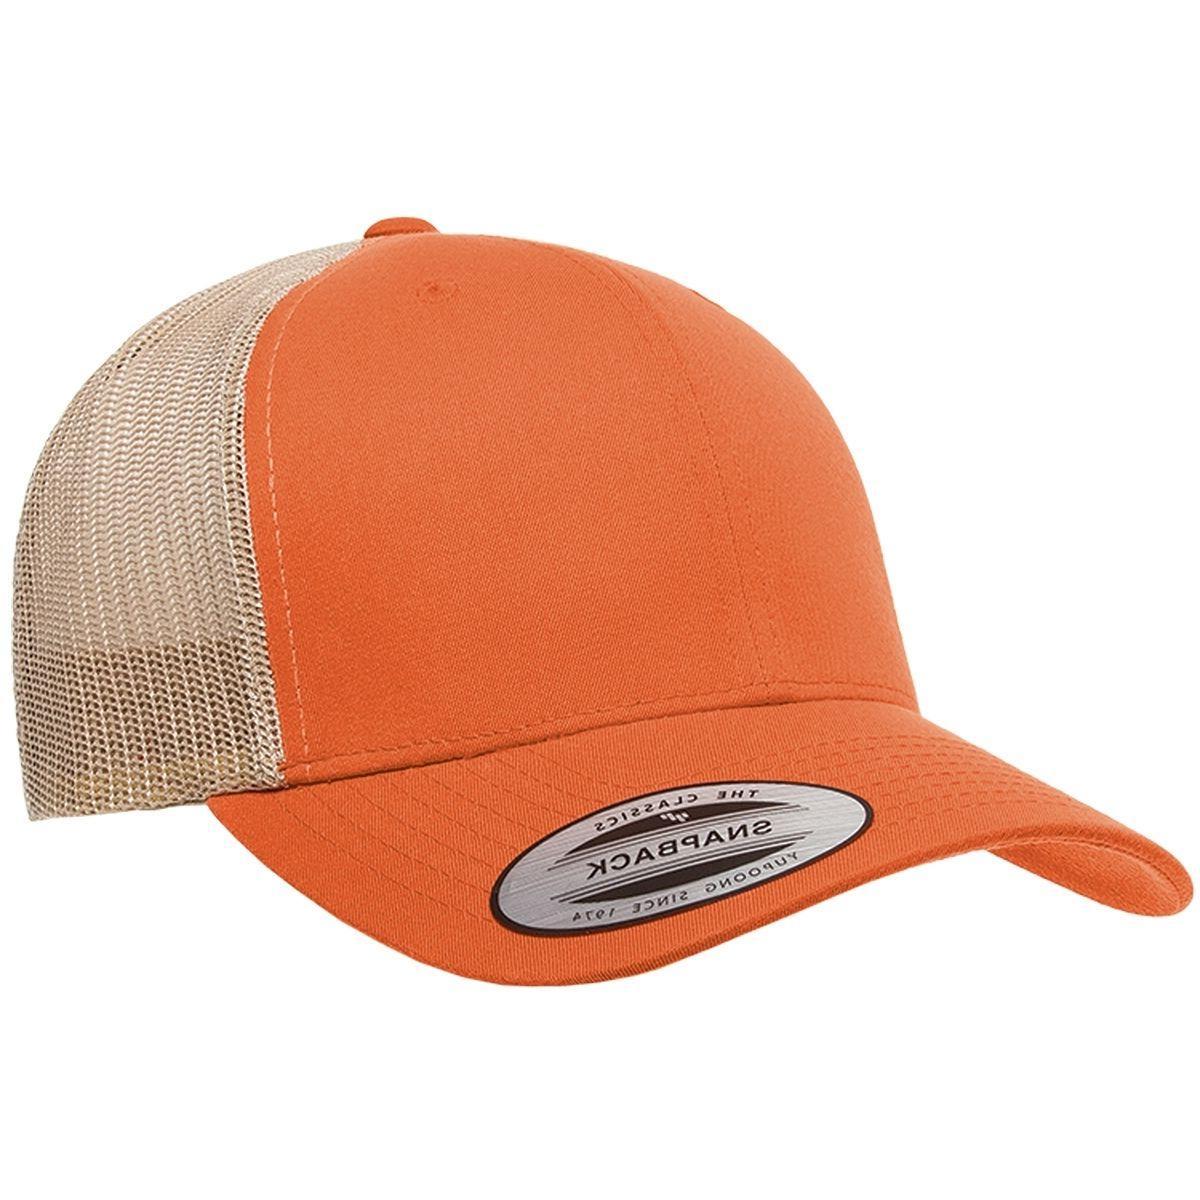 Yupoong Cotton Trucker Cap Snapback Hat 6606MC